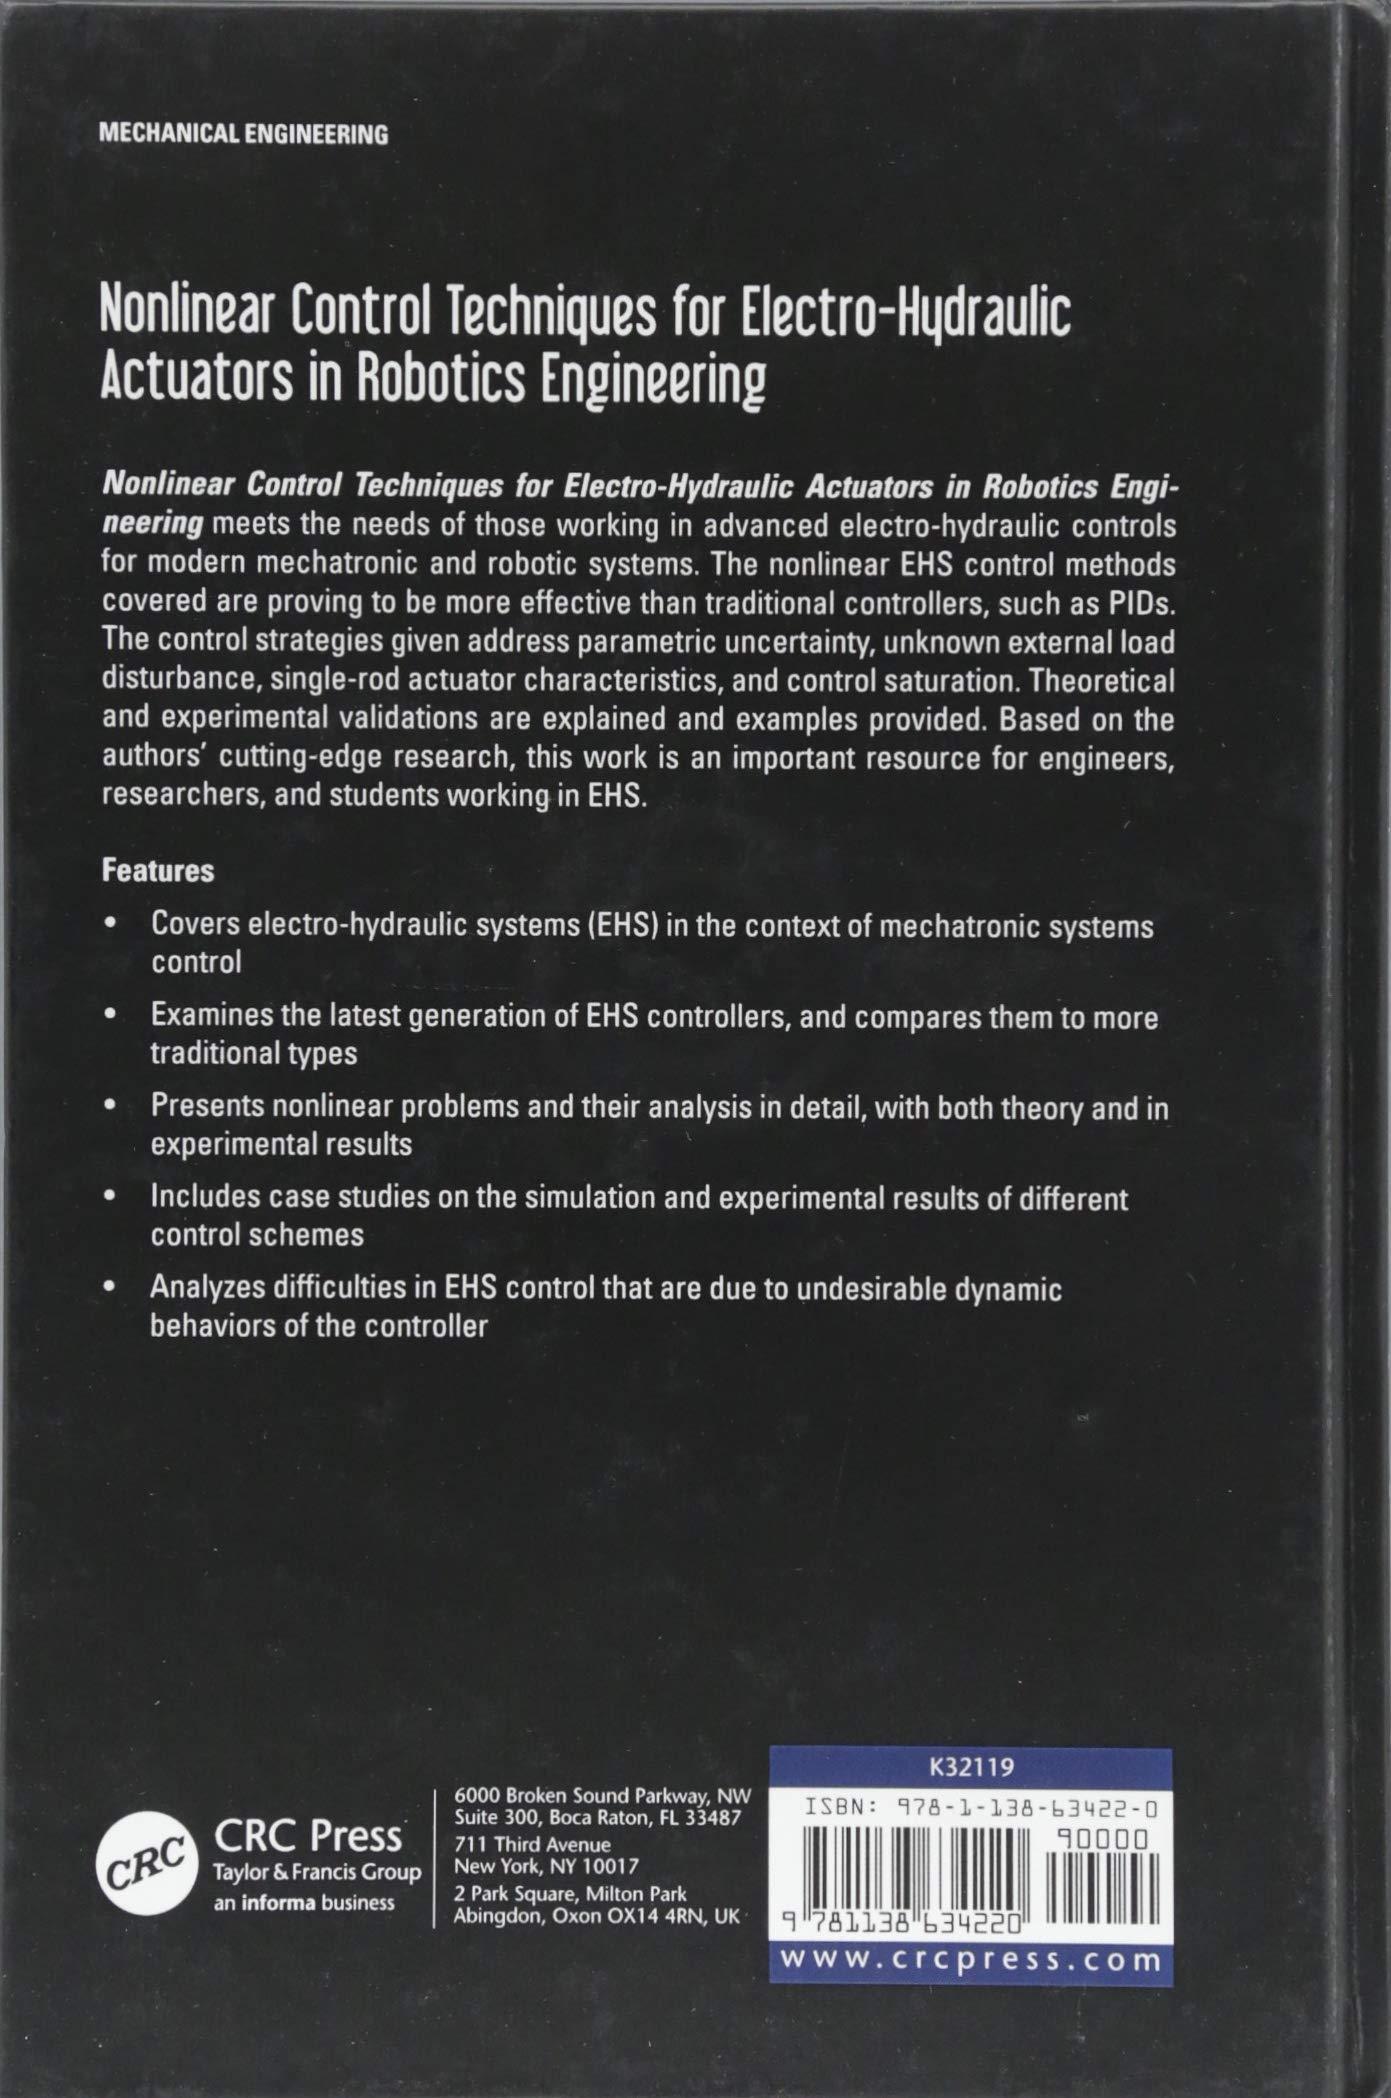 Nonlinear Control Techniques for Electro-Hydraulic Actuators